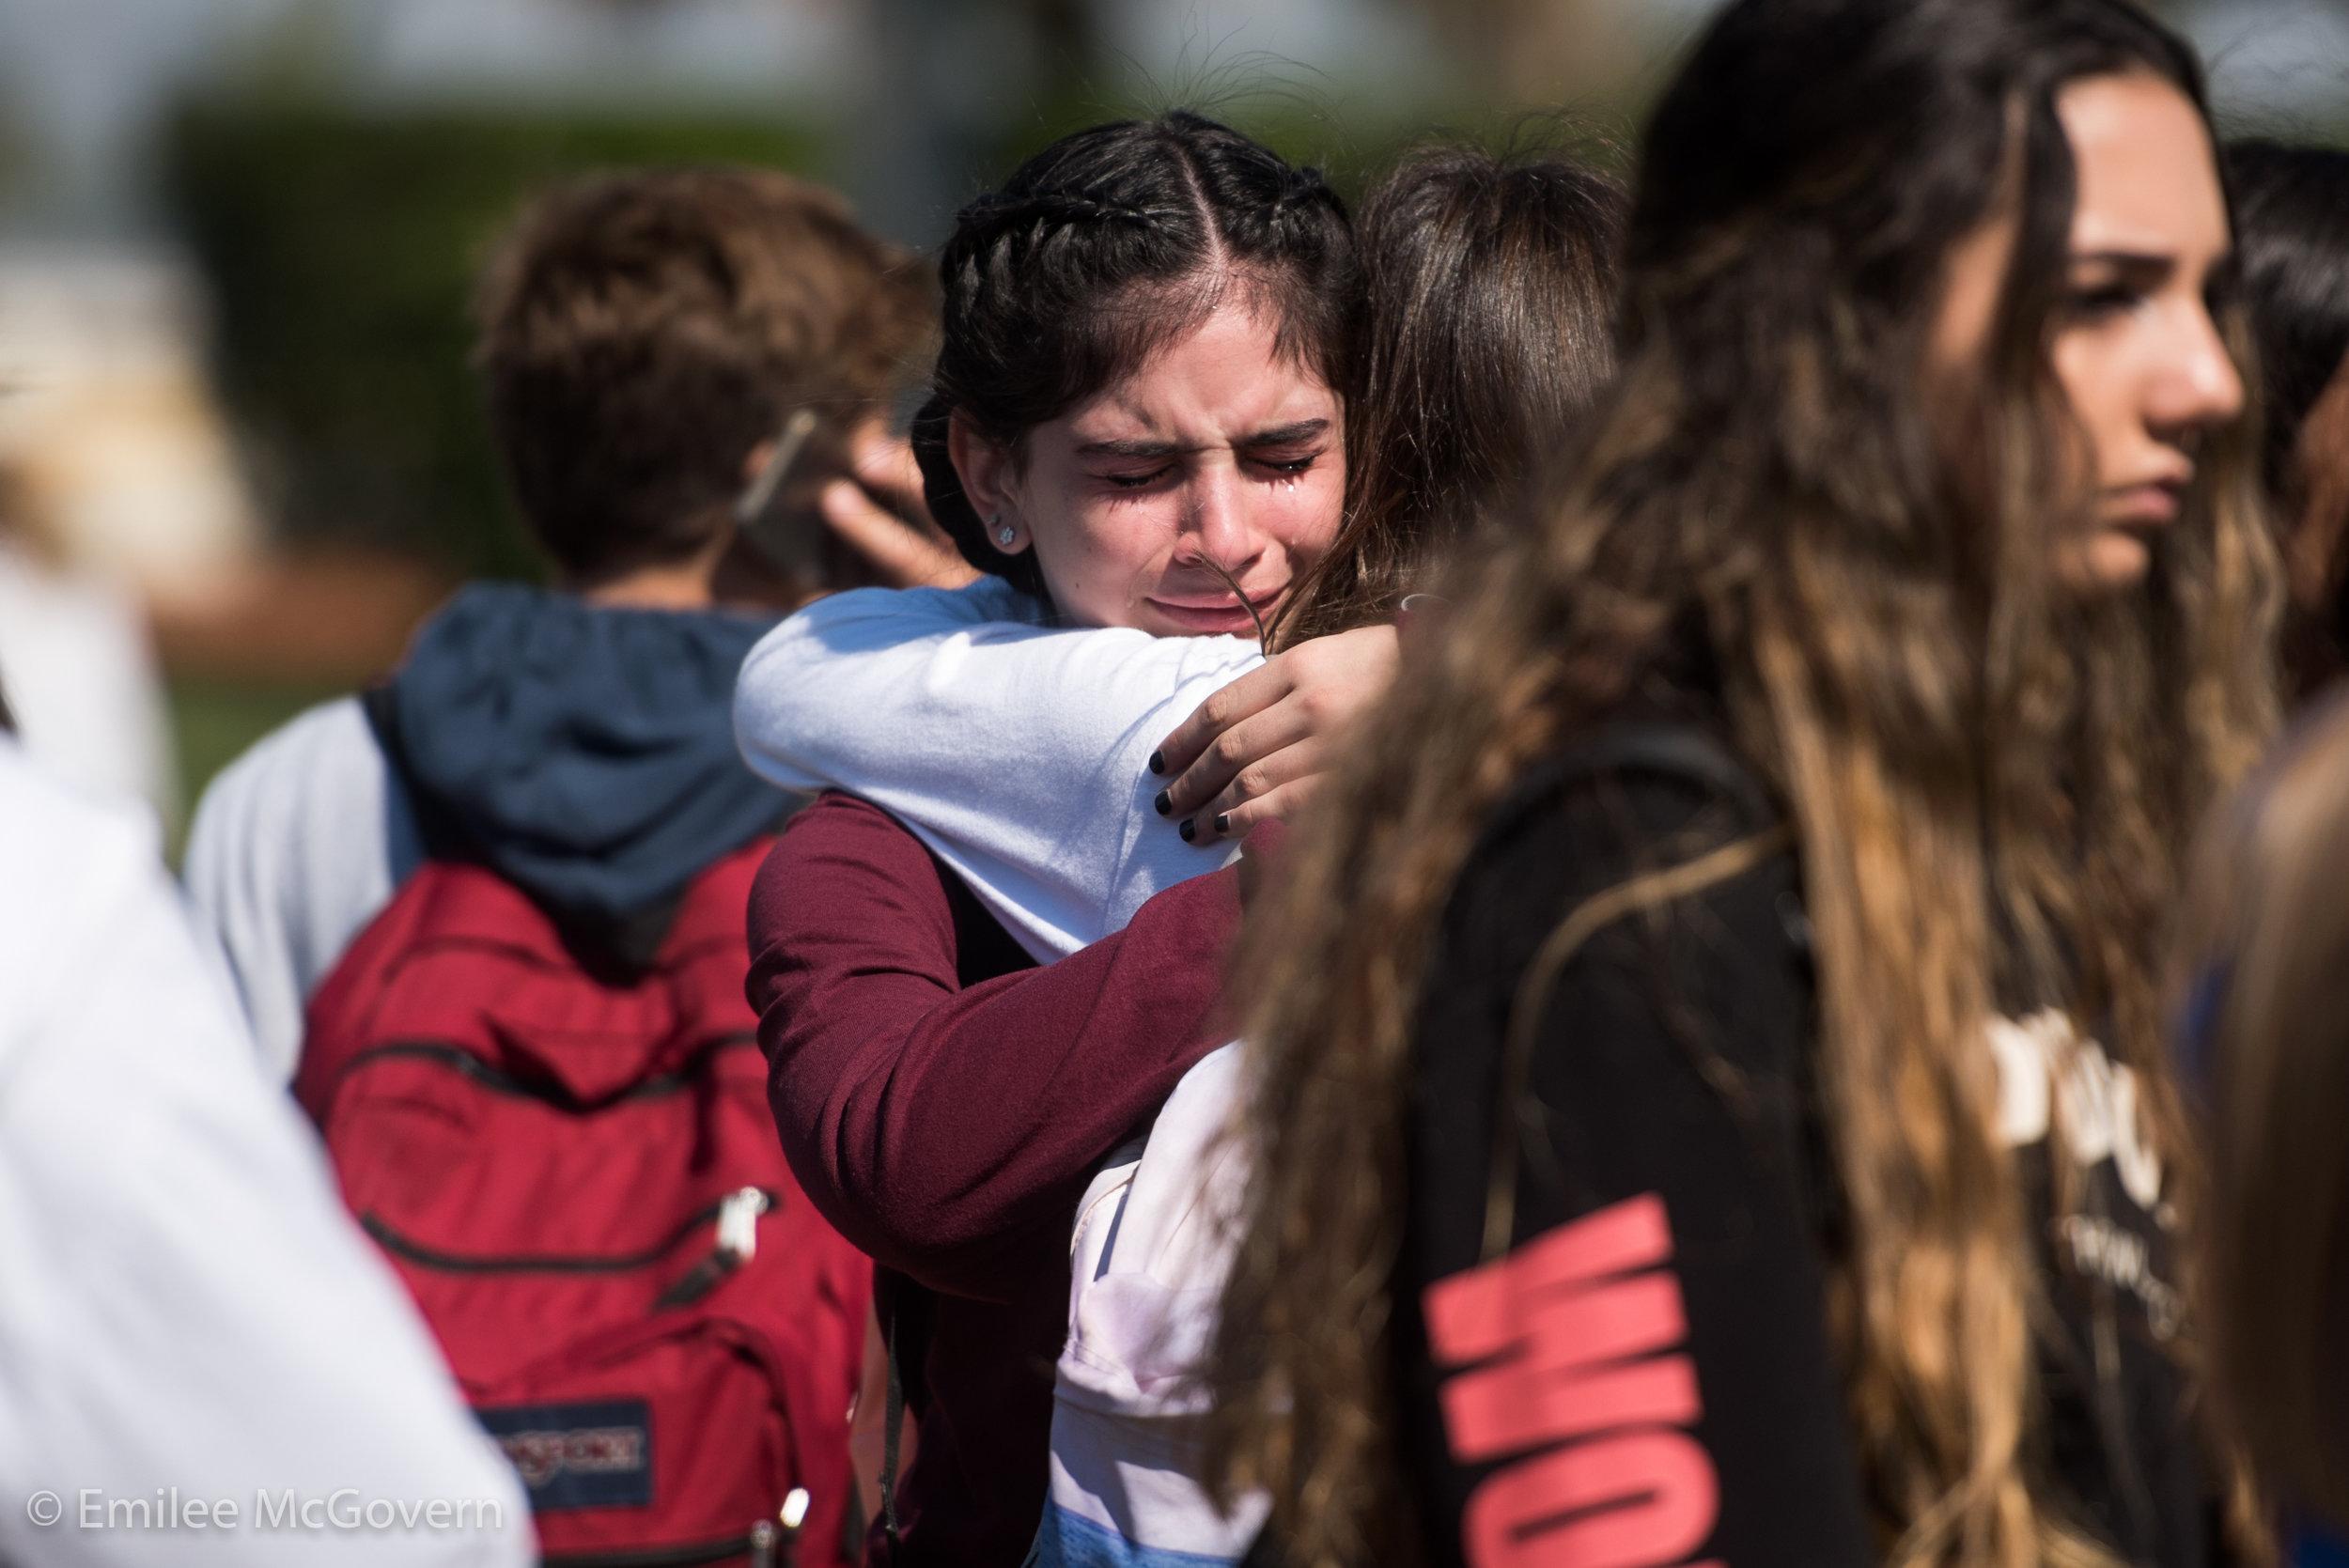 Marjory Stoneman Douglas School Shooting never again enough is enough emma gonzalez david hogg msd national school walkout -103.jpg